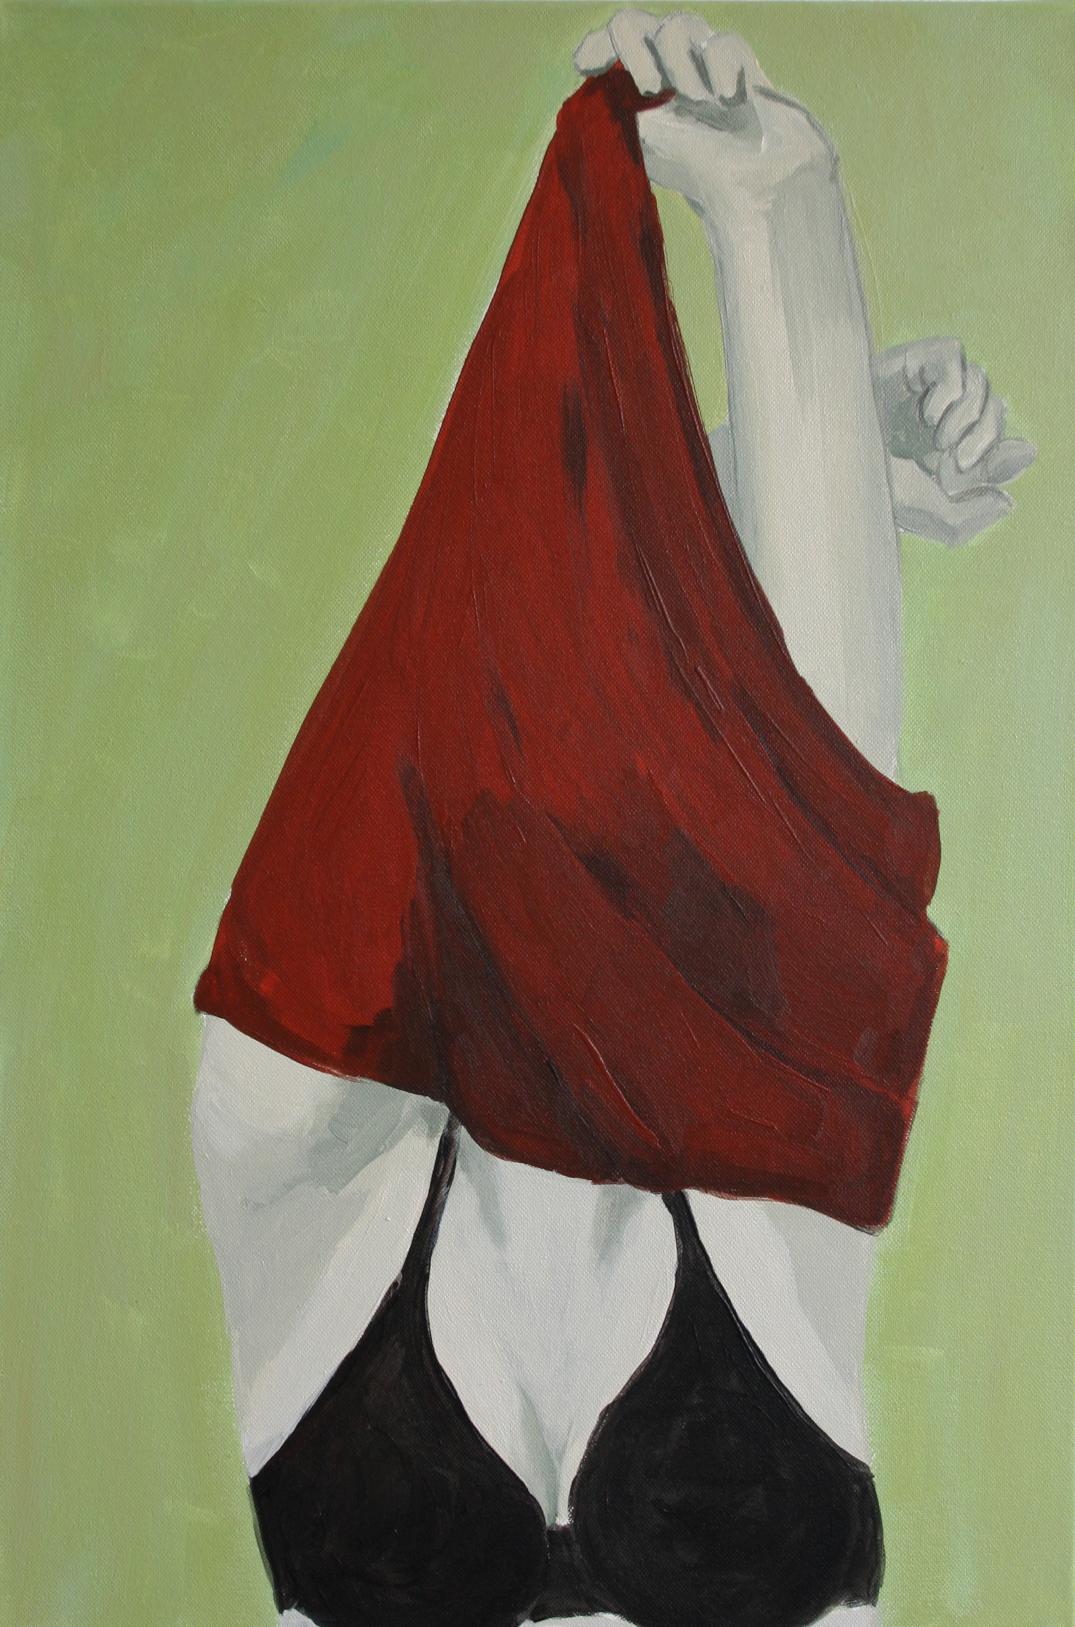 Ohne Titel, Acryl auf Leinwand, 40x60cm